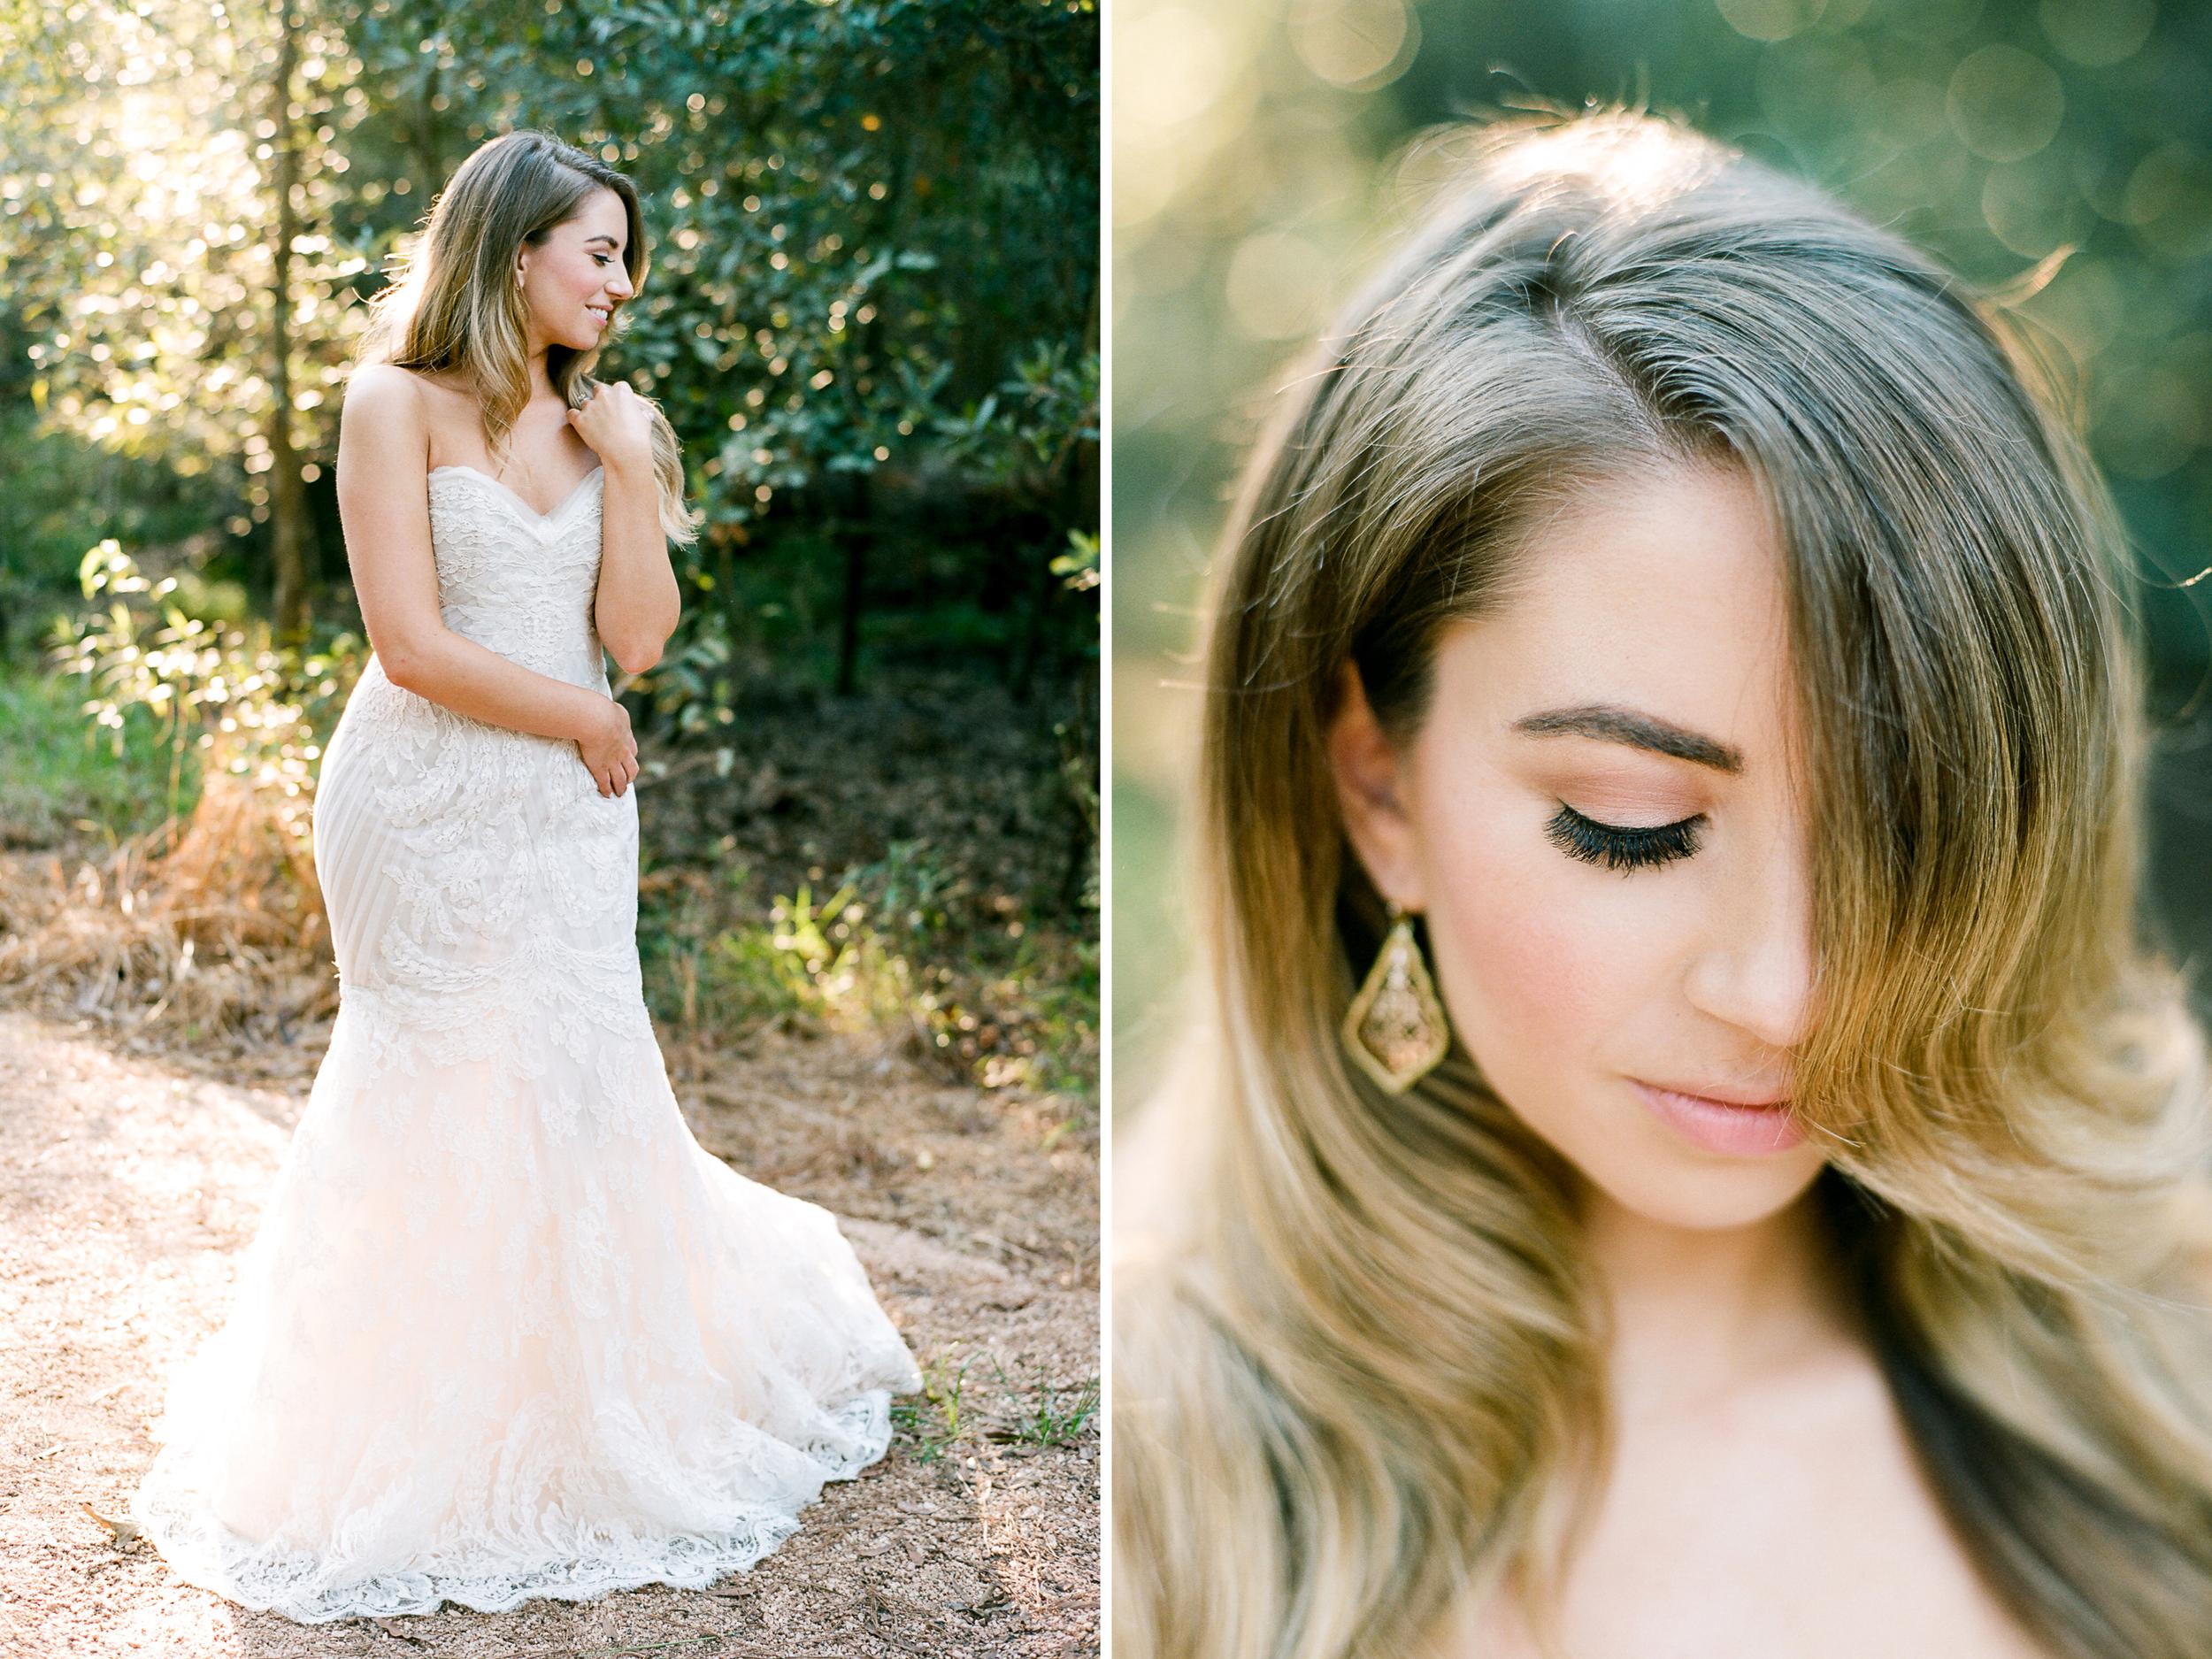 dana-fernandez-photography-the-wedding-chicks-film-houston-wedding-photography-destination-120.jpg